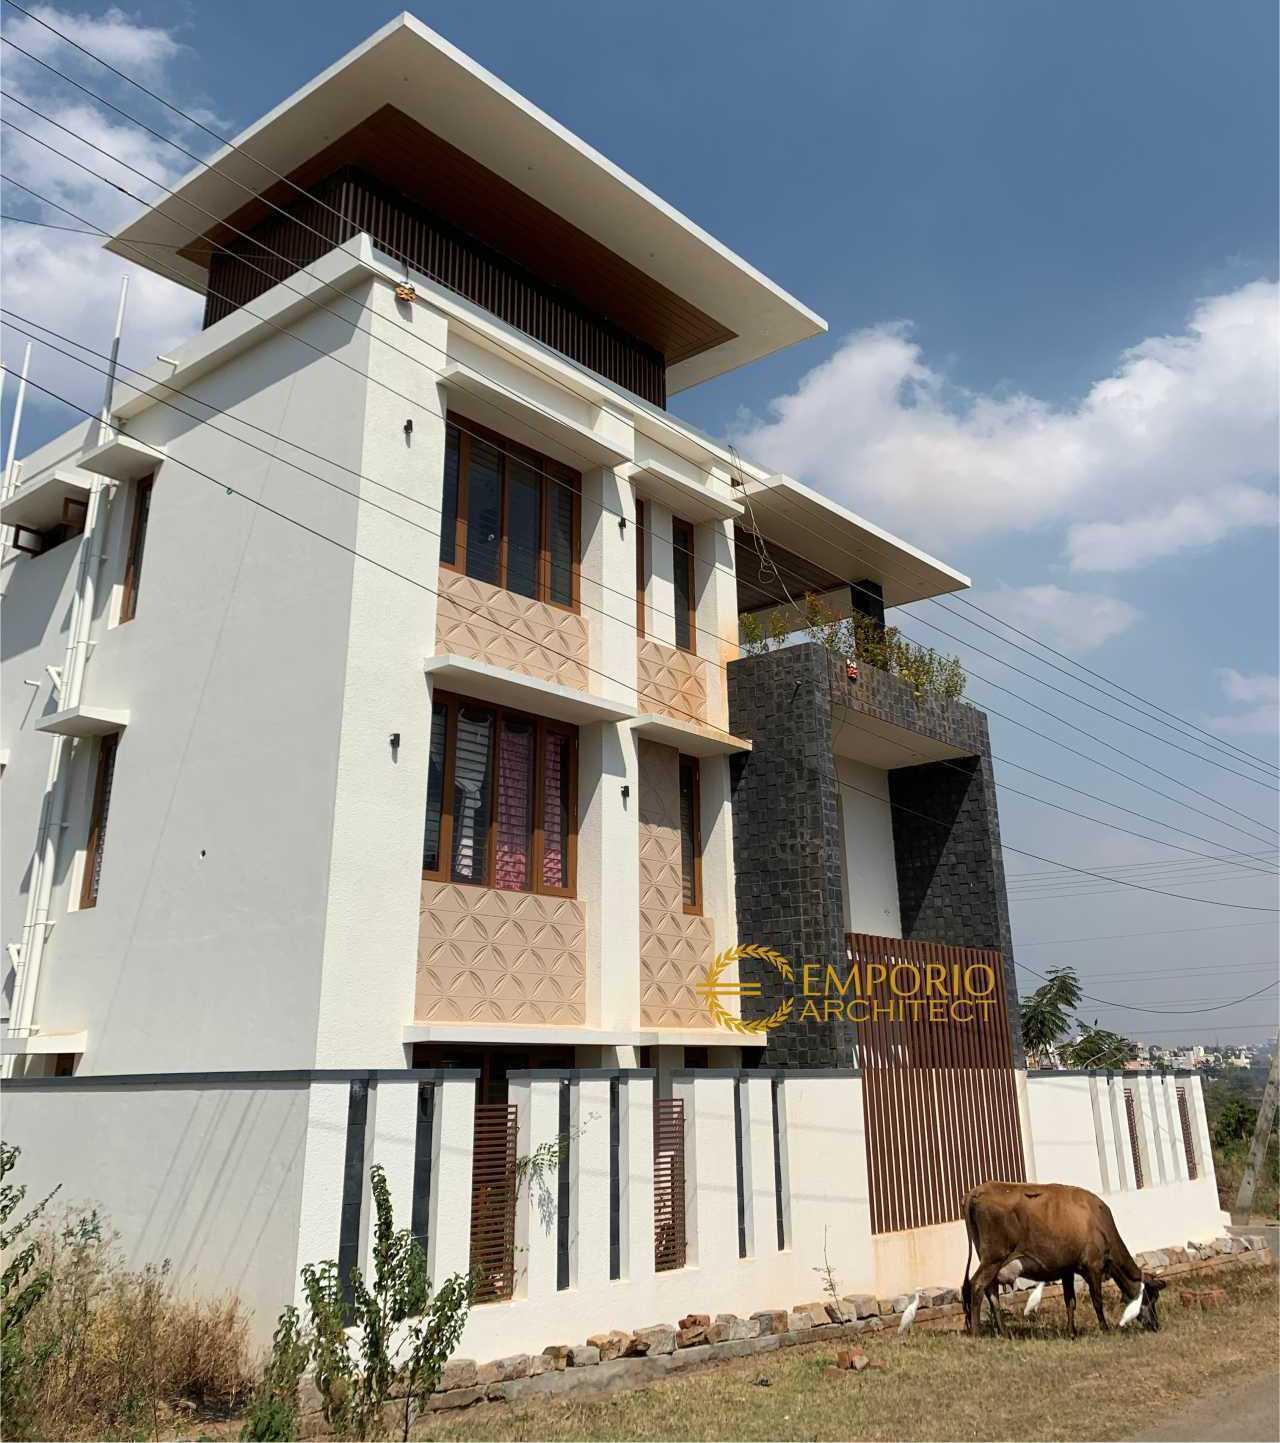 Emporio Architect Jasa Arsitek India Hasil Konstruksi Rumah Modern Tropis 422 @ Banglore, India Bengaluru, Karnataka, India Bengaluru, Karnataka, India Emporio-Architect-Jasa-Arsitek-India-Hasil-Konstruksi-Rumah-Modern-Tropis-422-Banglore-India  85852